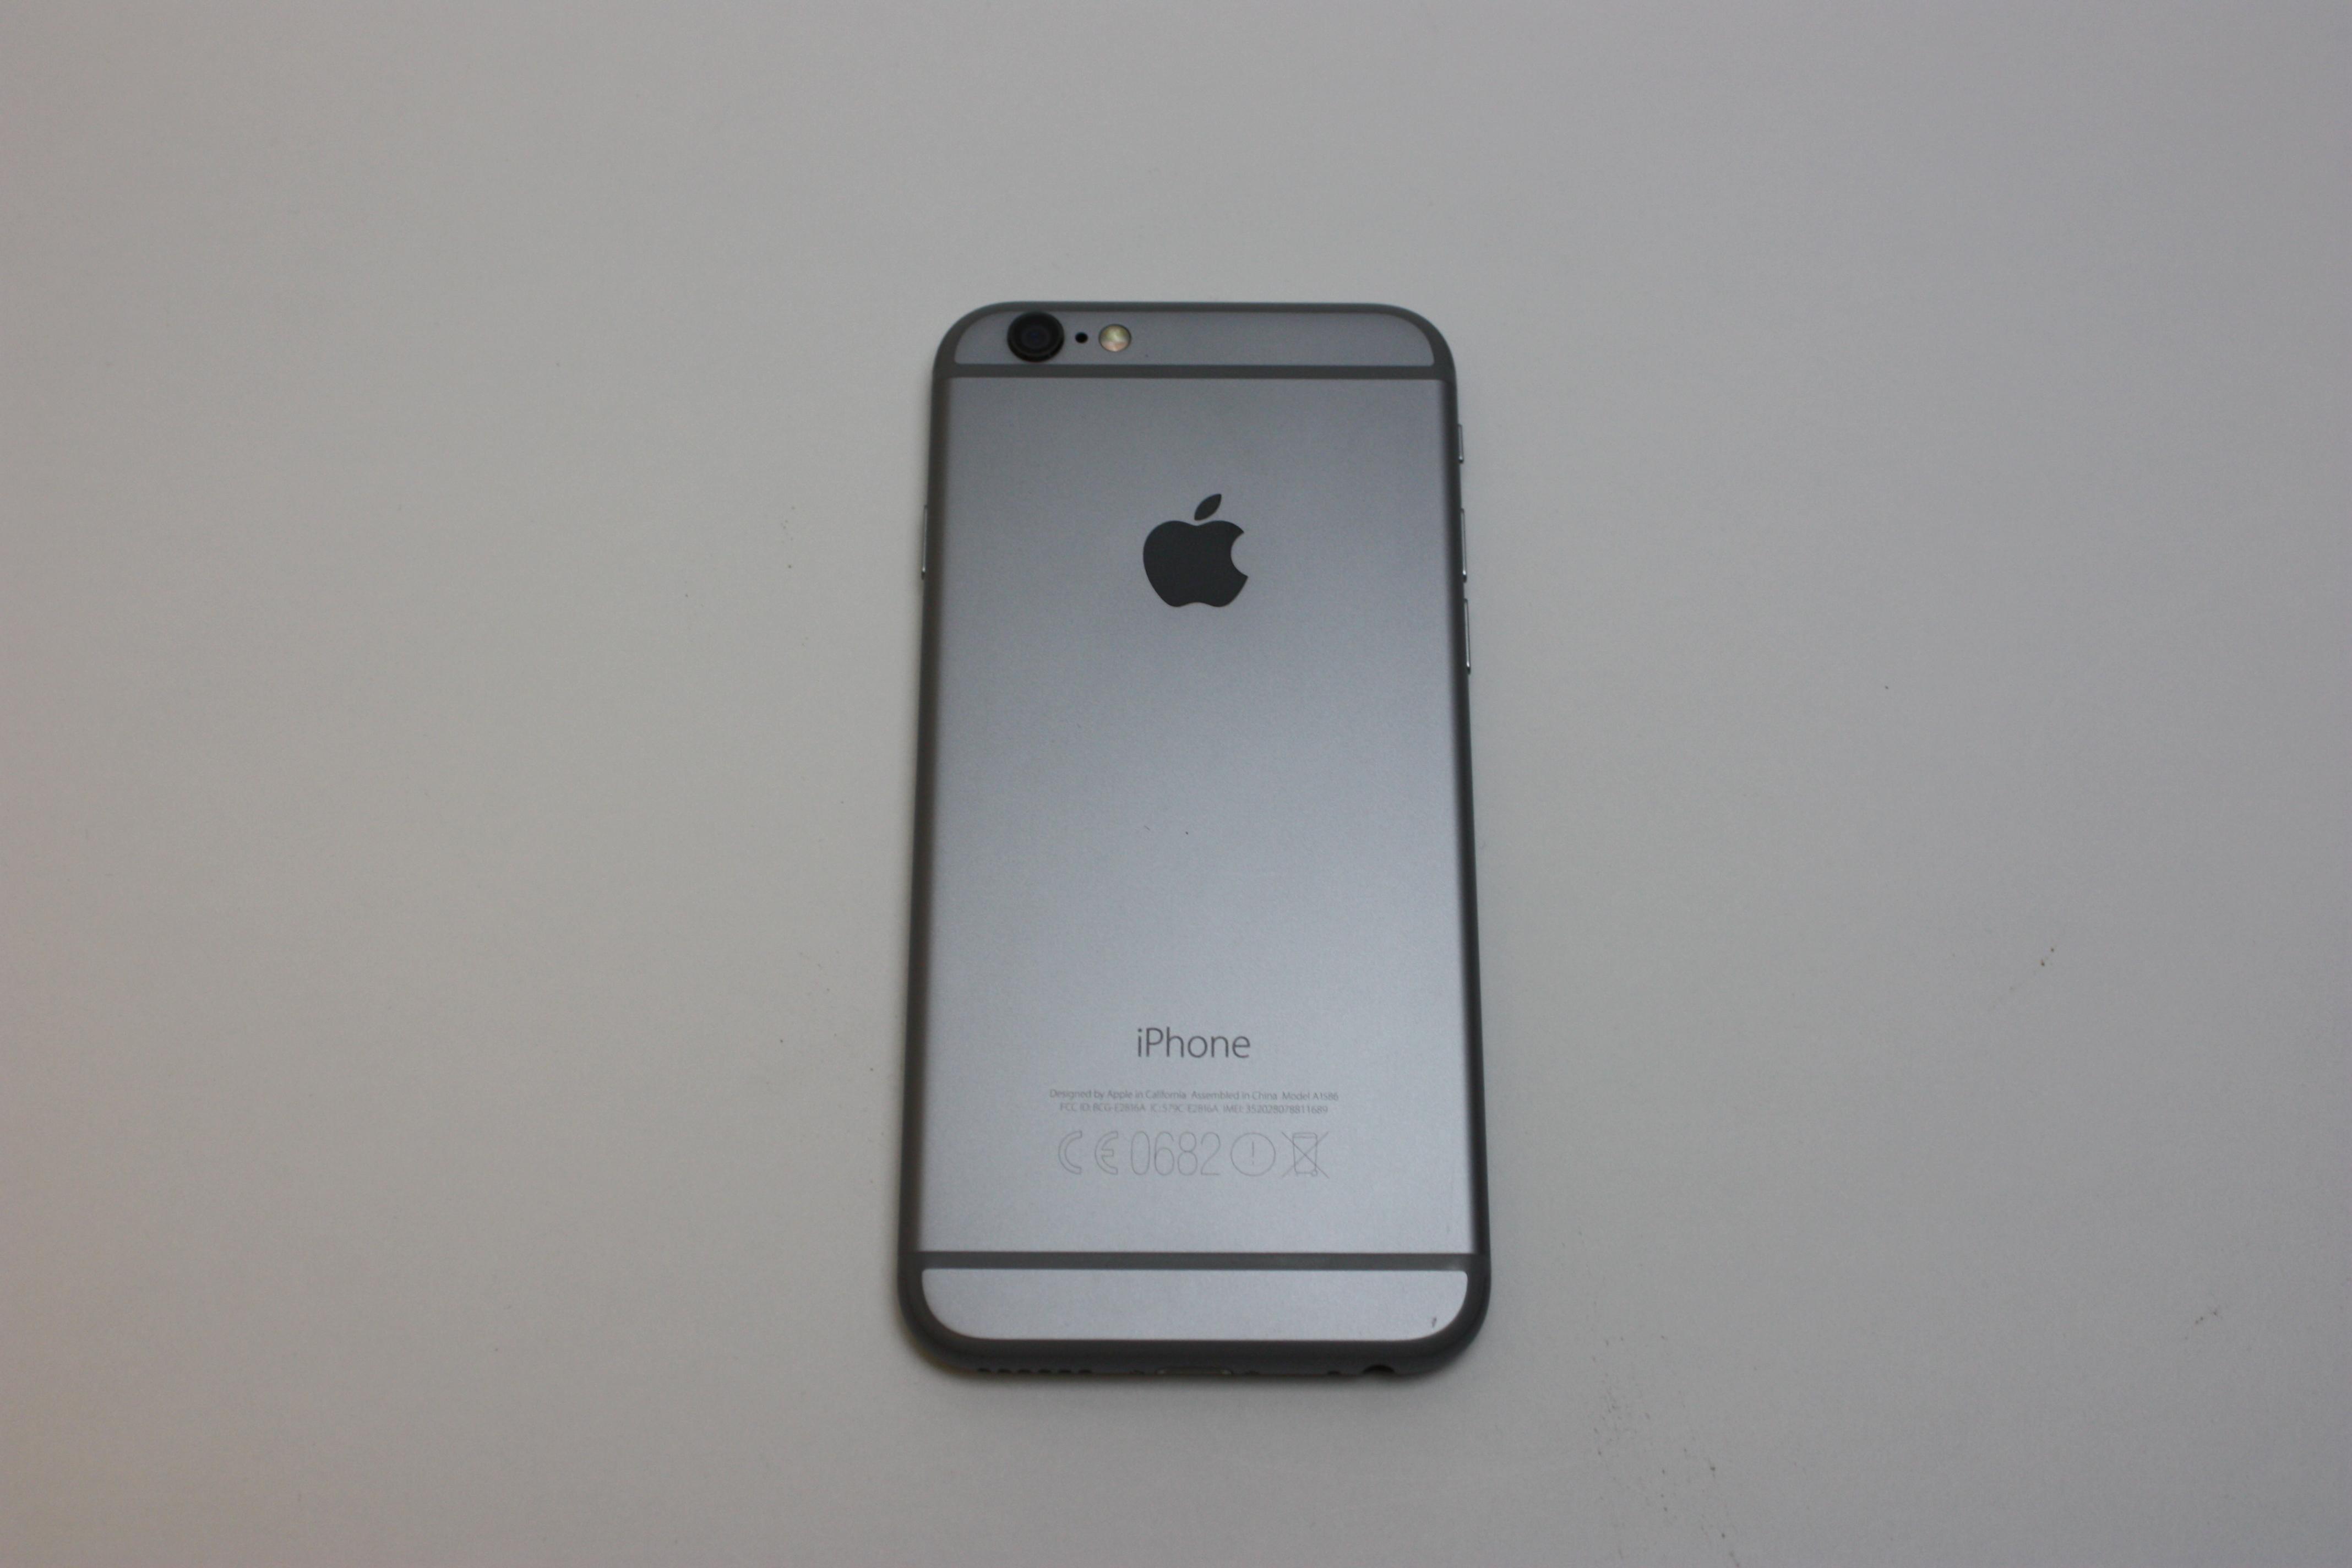 iPhone 6, 16 GB, Space Grey, image 2